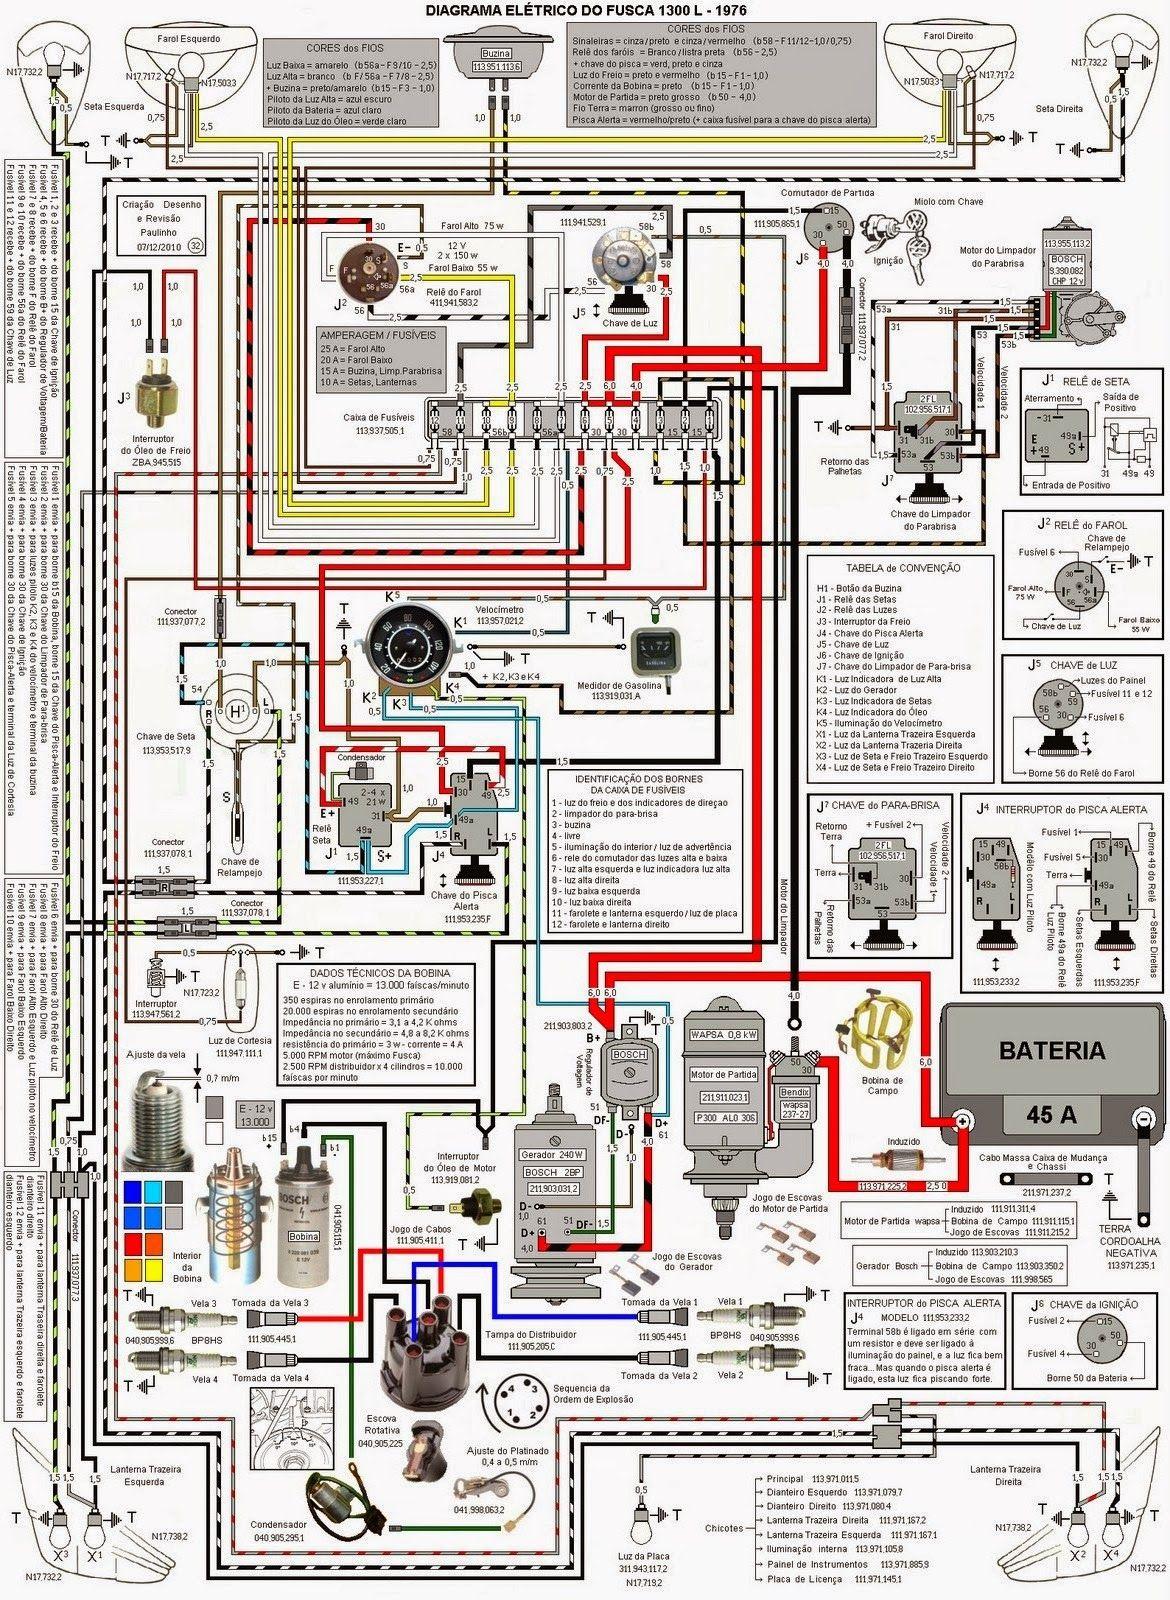 Esquema Fusca Jpg 1170 1600 Motor Vocho Motor De Vocho Vw Vocho